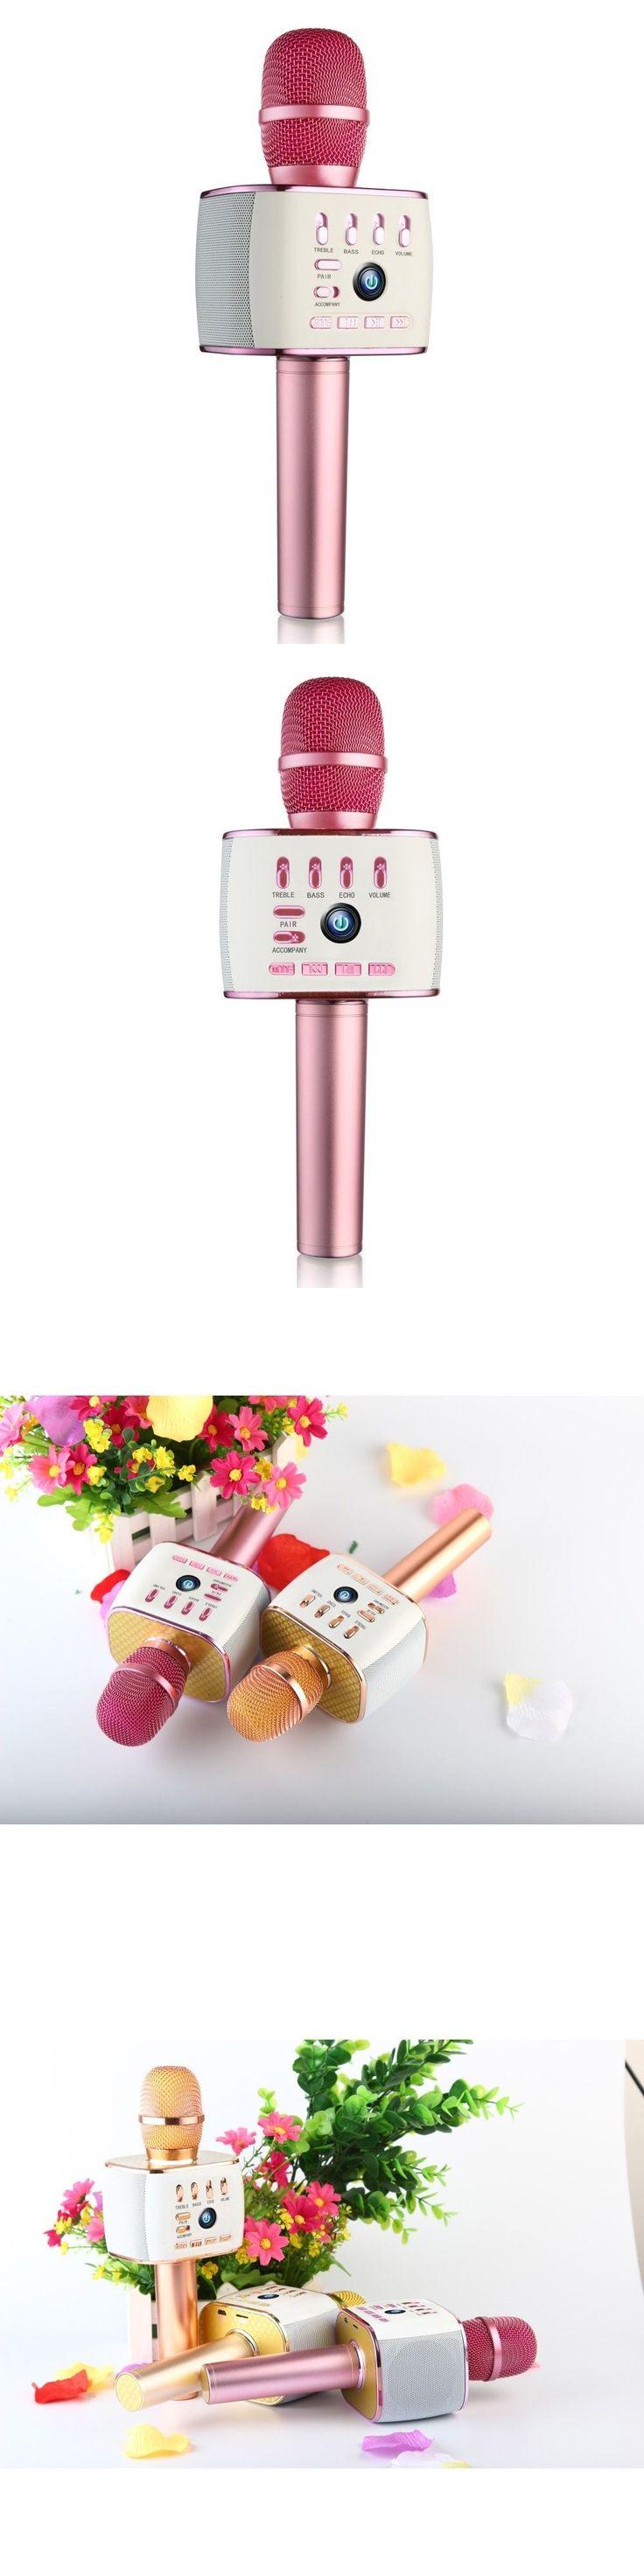 Mini Plug-in Microphones: Dual Speaker Wireless Bluetooth Karaoke Microphone For Ktv Singing Recorder -> BUY IT NOW ONLY: $42.55 on eBay!